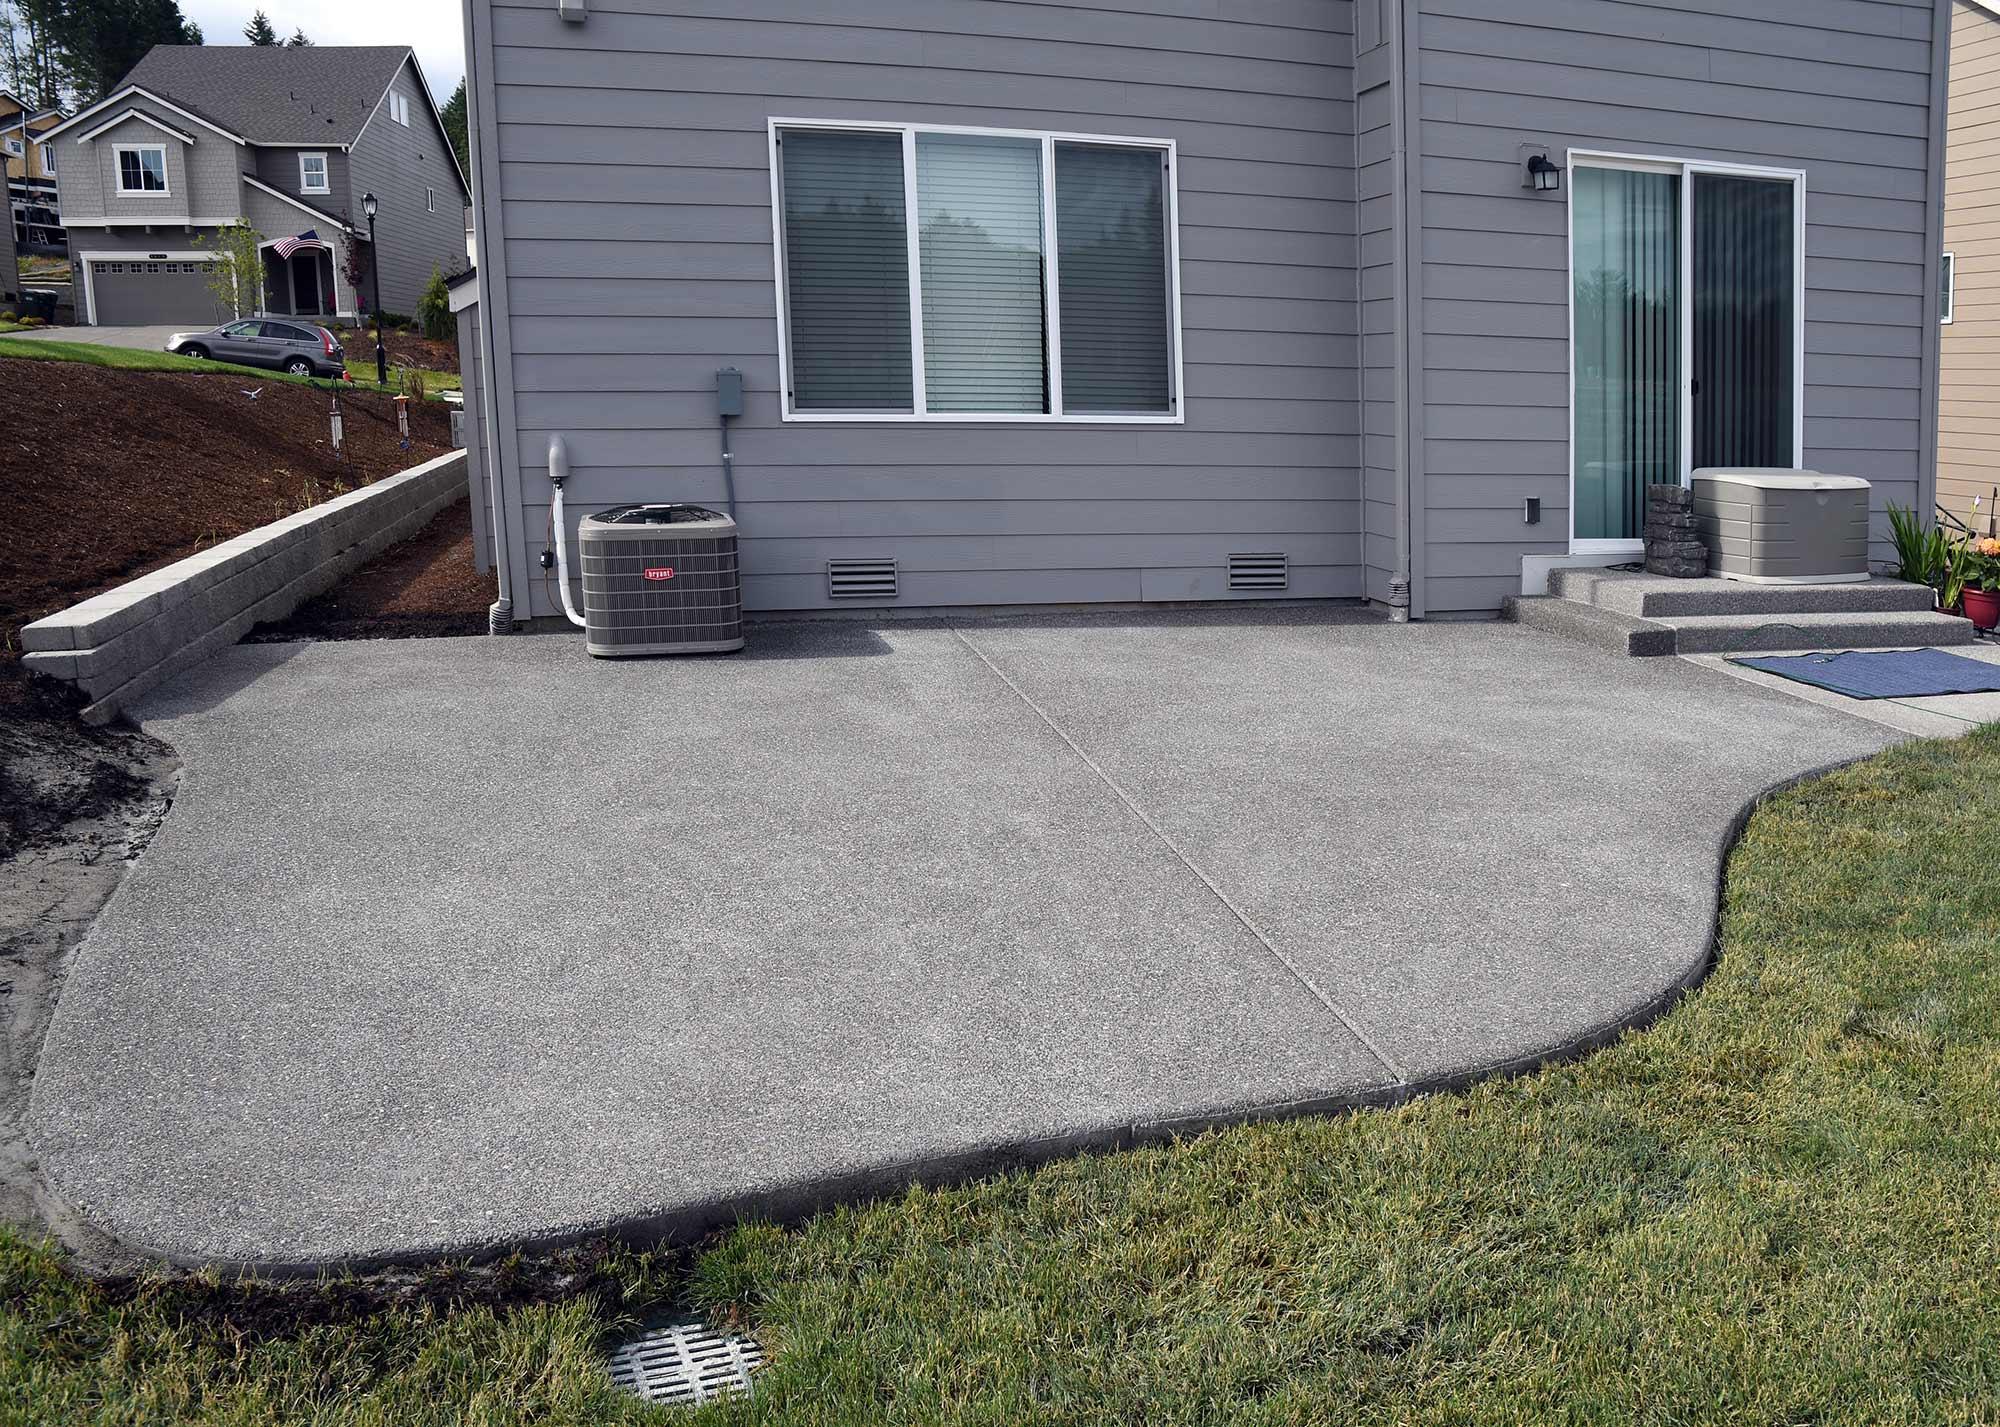 Hawks Prairie Concrete Patio Extension - AJB Landscaping ... on Backyard Patio Extension id=45421